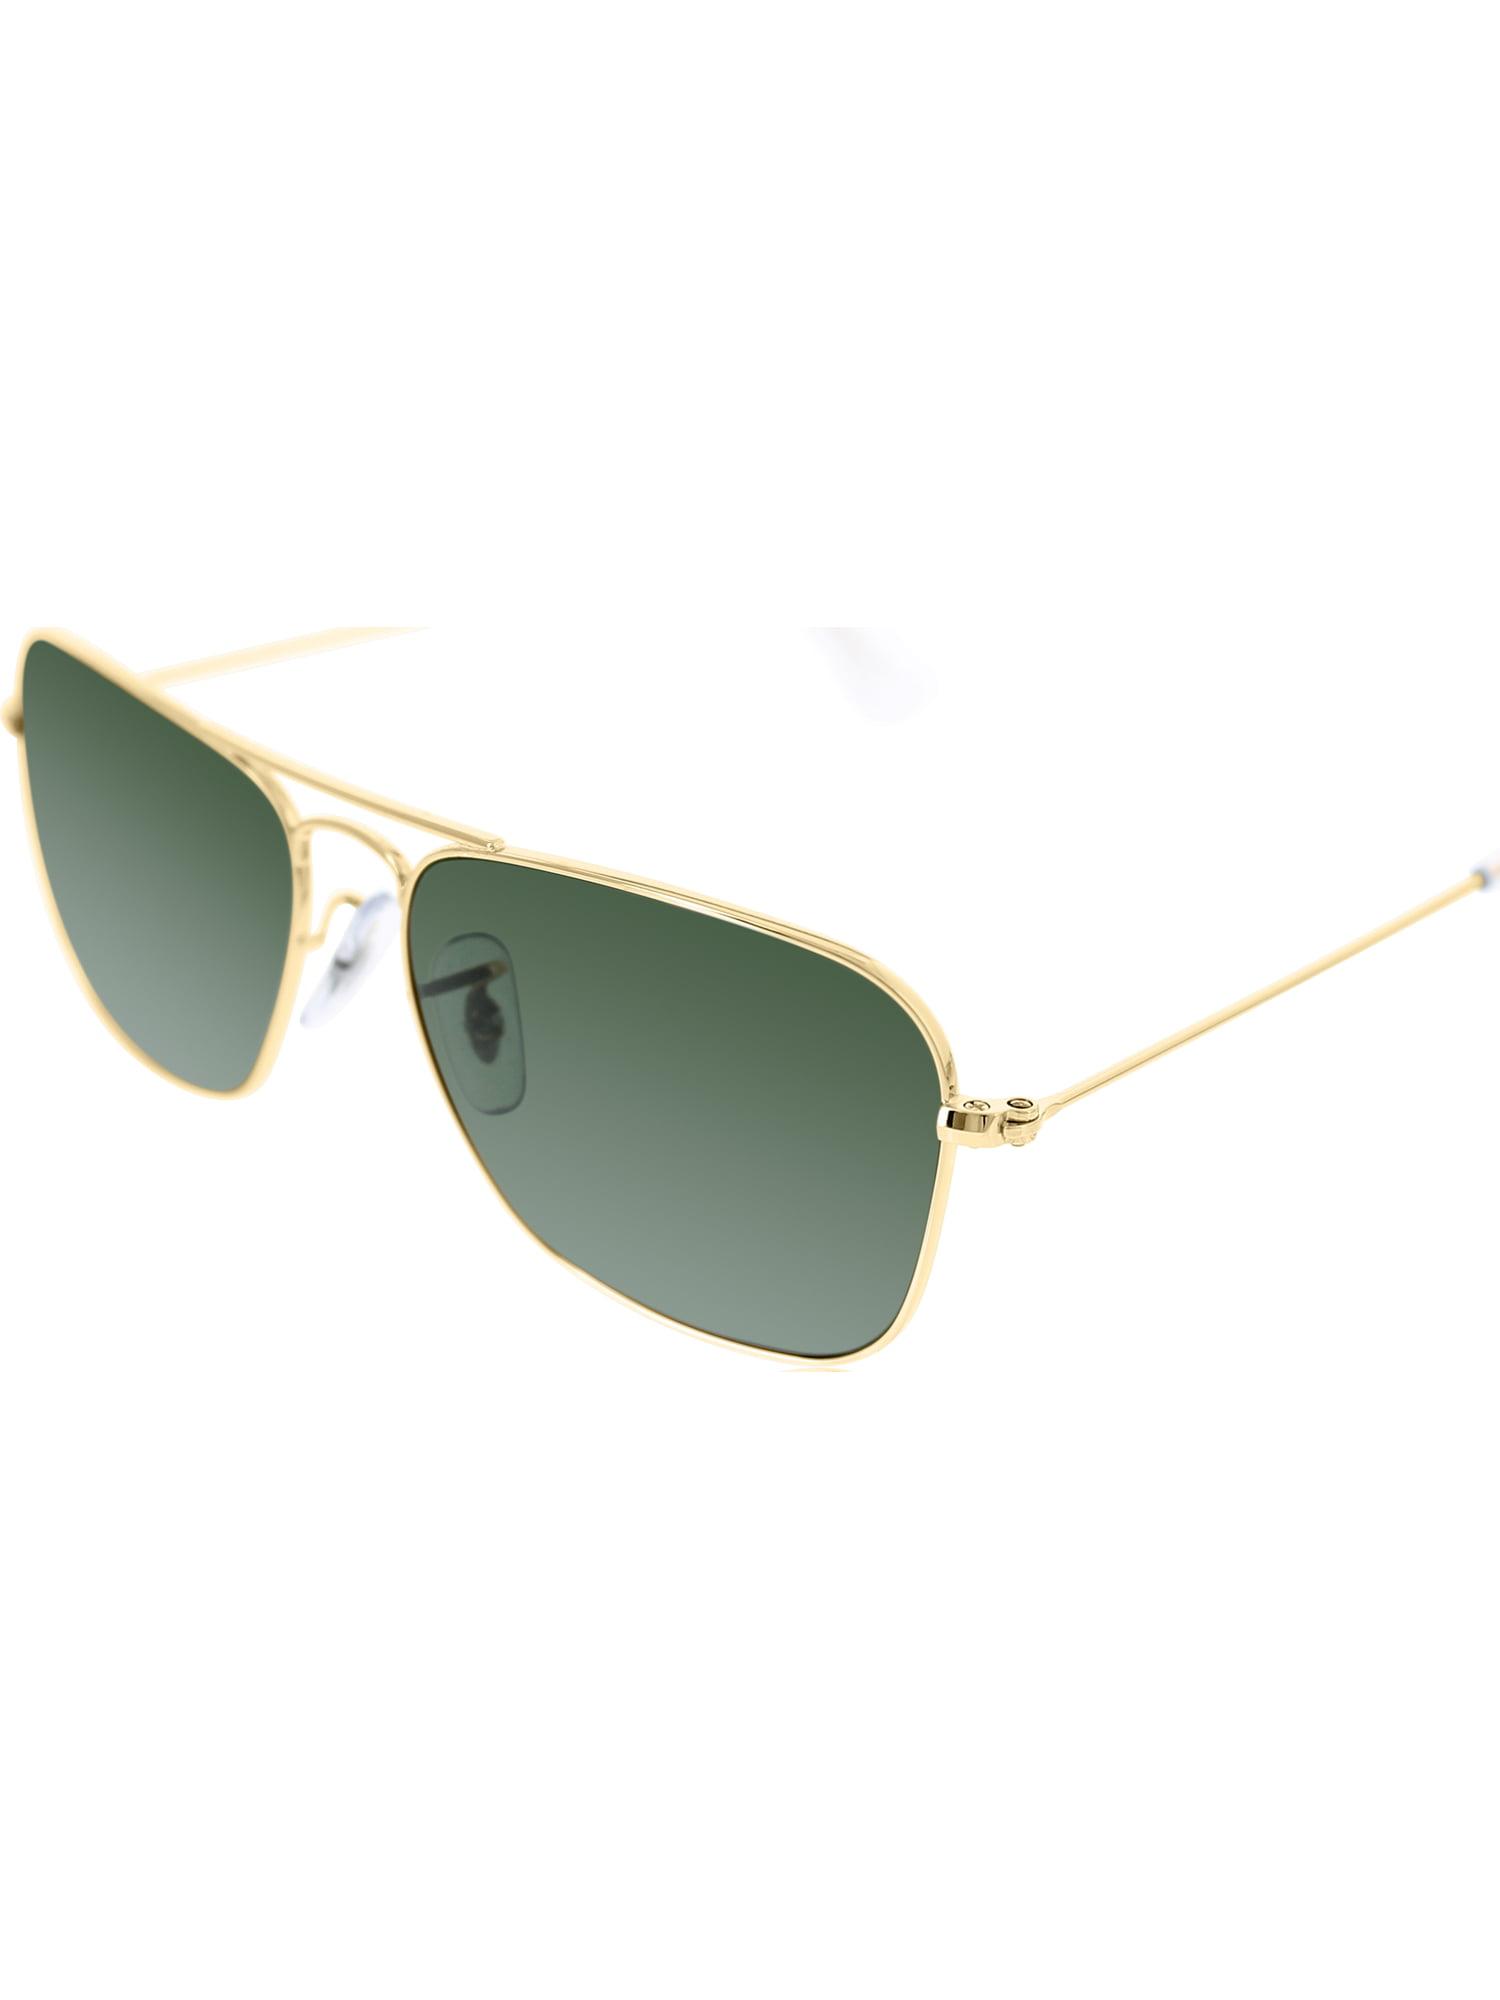 Ray-Ban Men s Caravan RB3136-001-55 Gold Square Sunglasses a054129c95